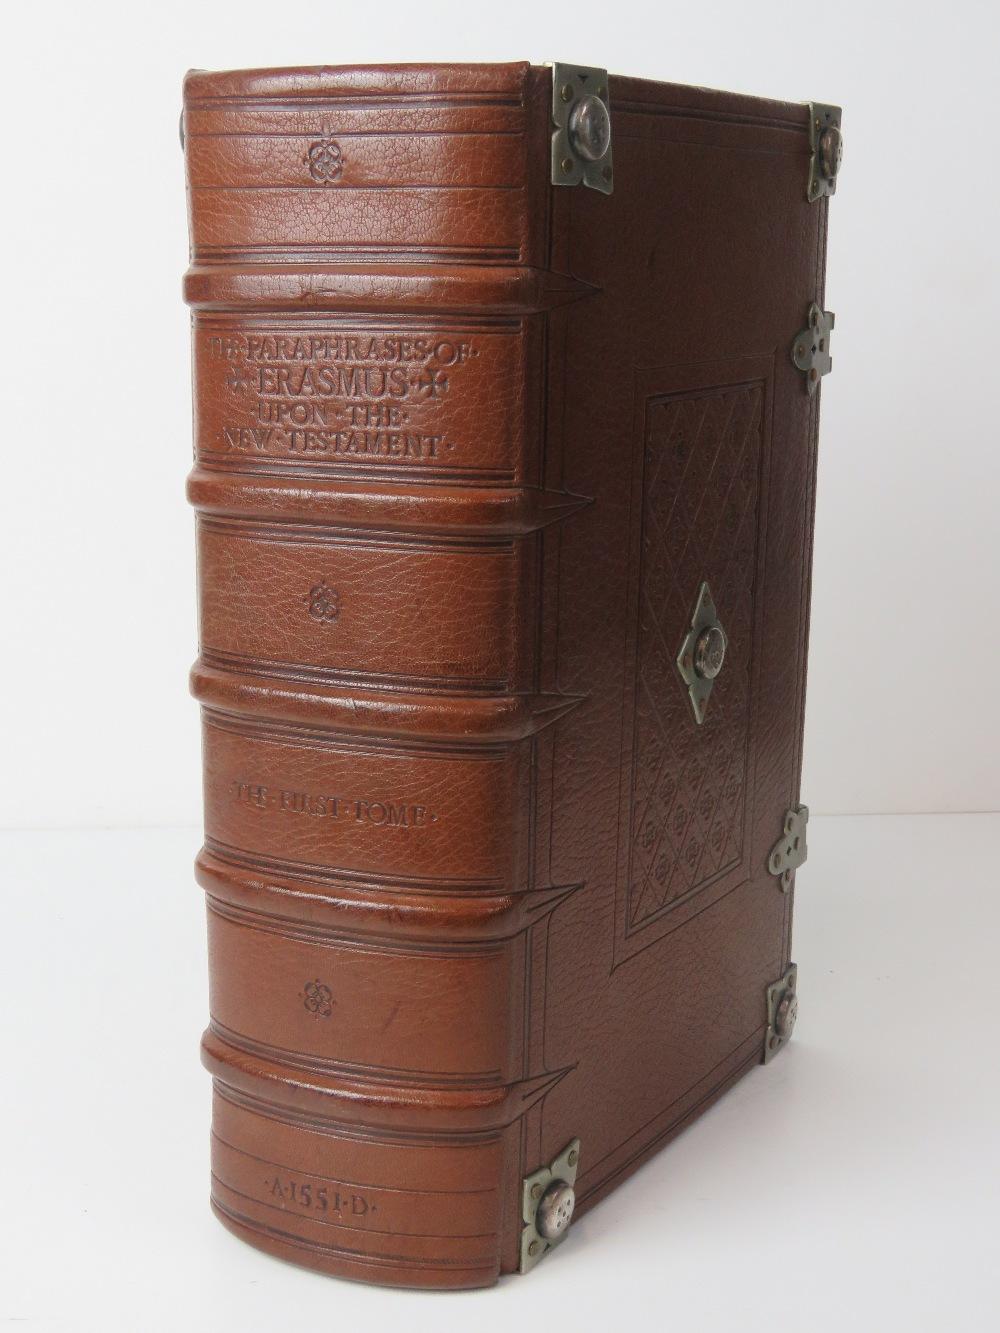 Book; The Paraphrase of Erasmus Upon the